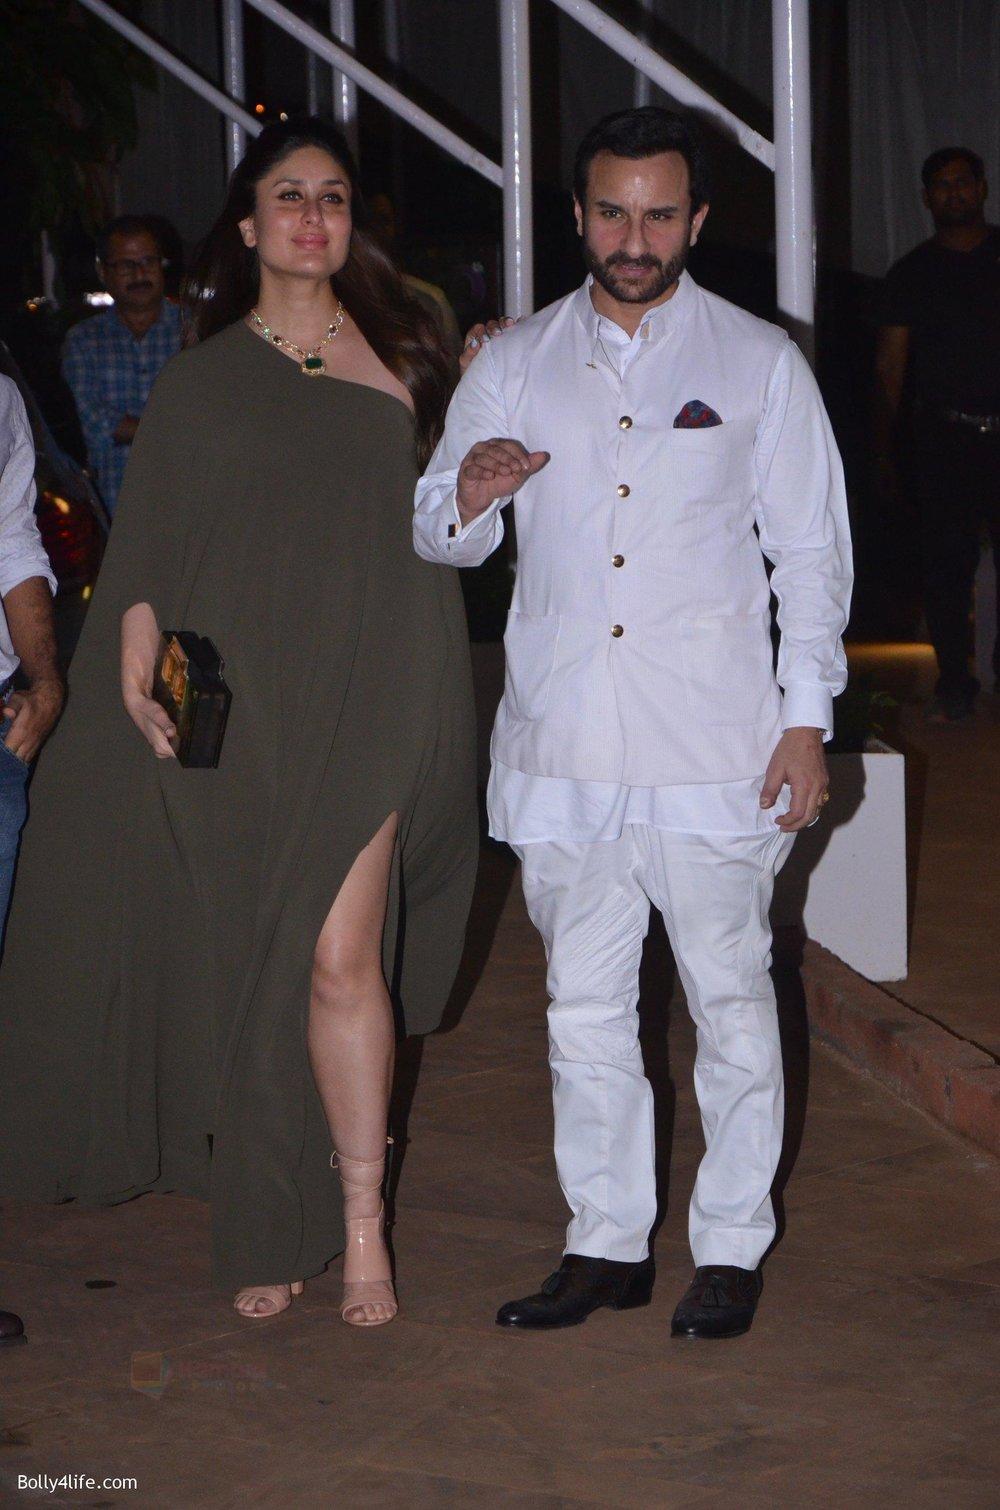 Saif-Ali-Khan-Kareena-Kapoor-at-Reema-jain-bday-party-in-Amadeus-NCPA-on-28th-Sept-2016-859.jpg